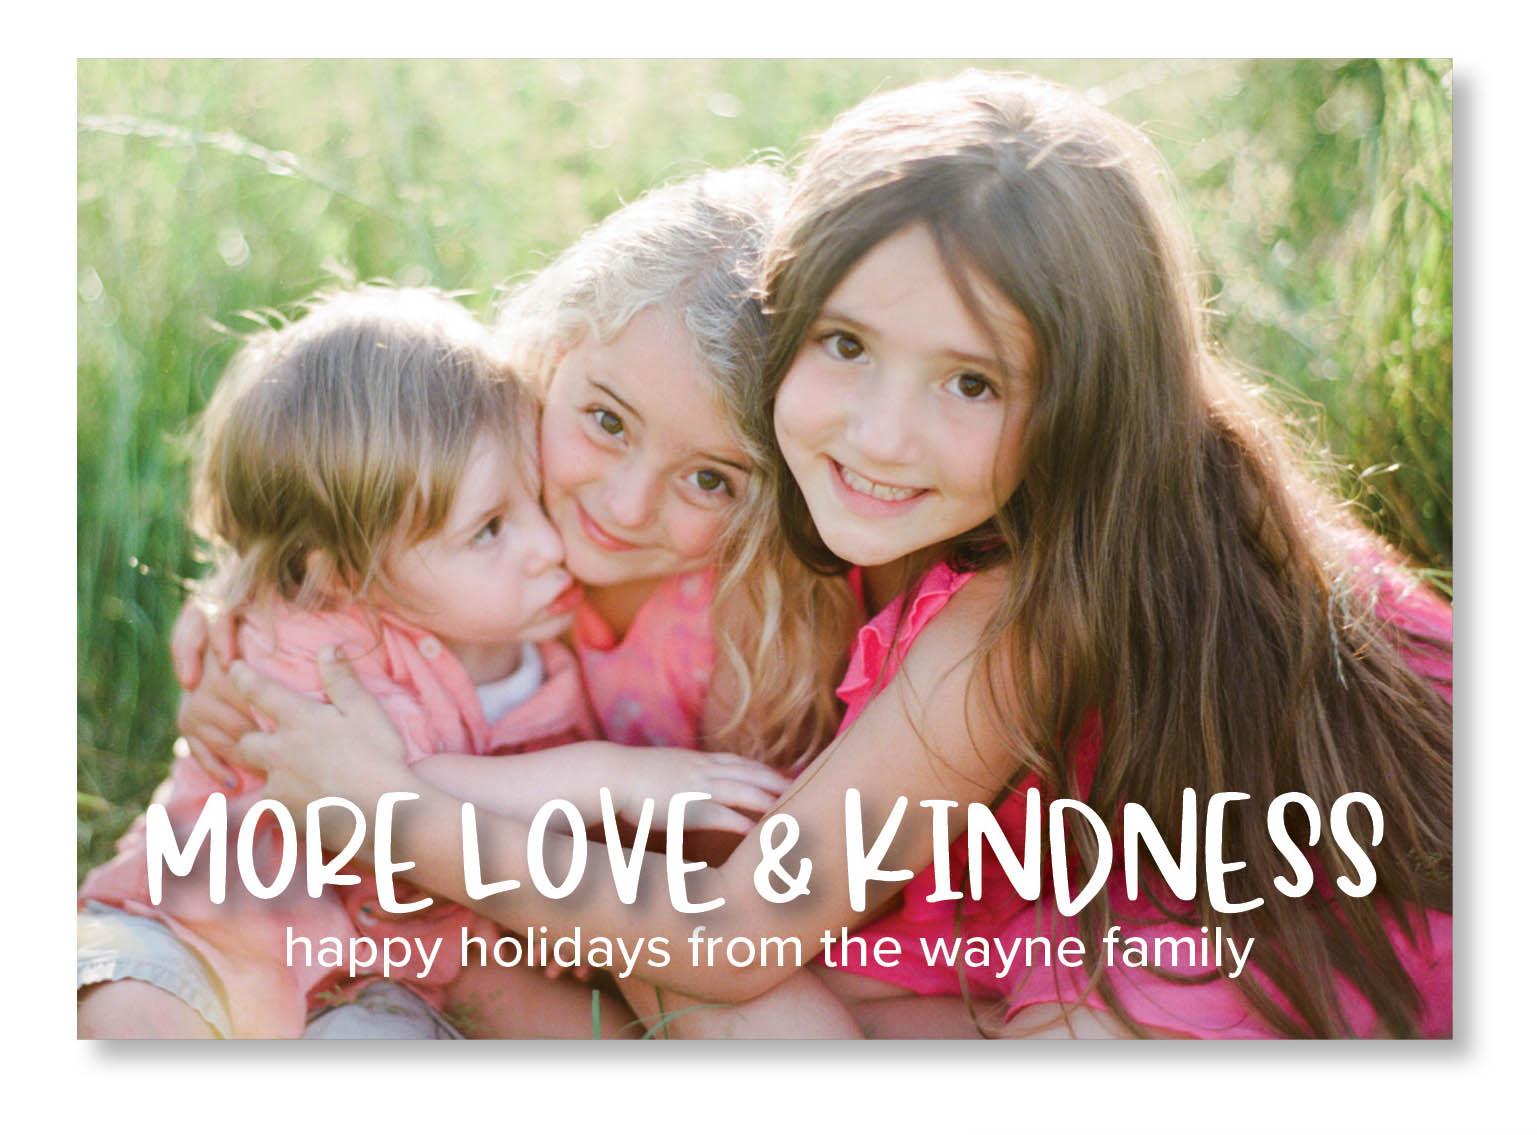 IDH_MoreLove&Kindness_Front